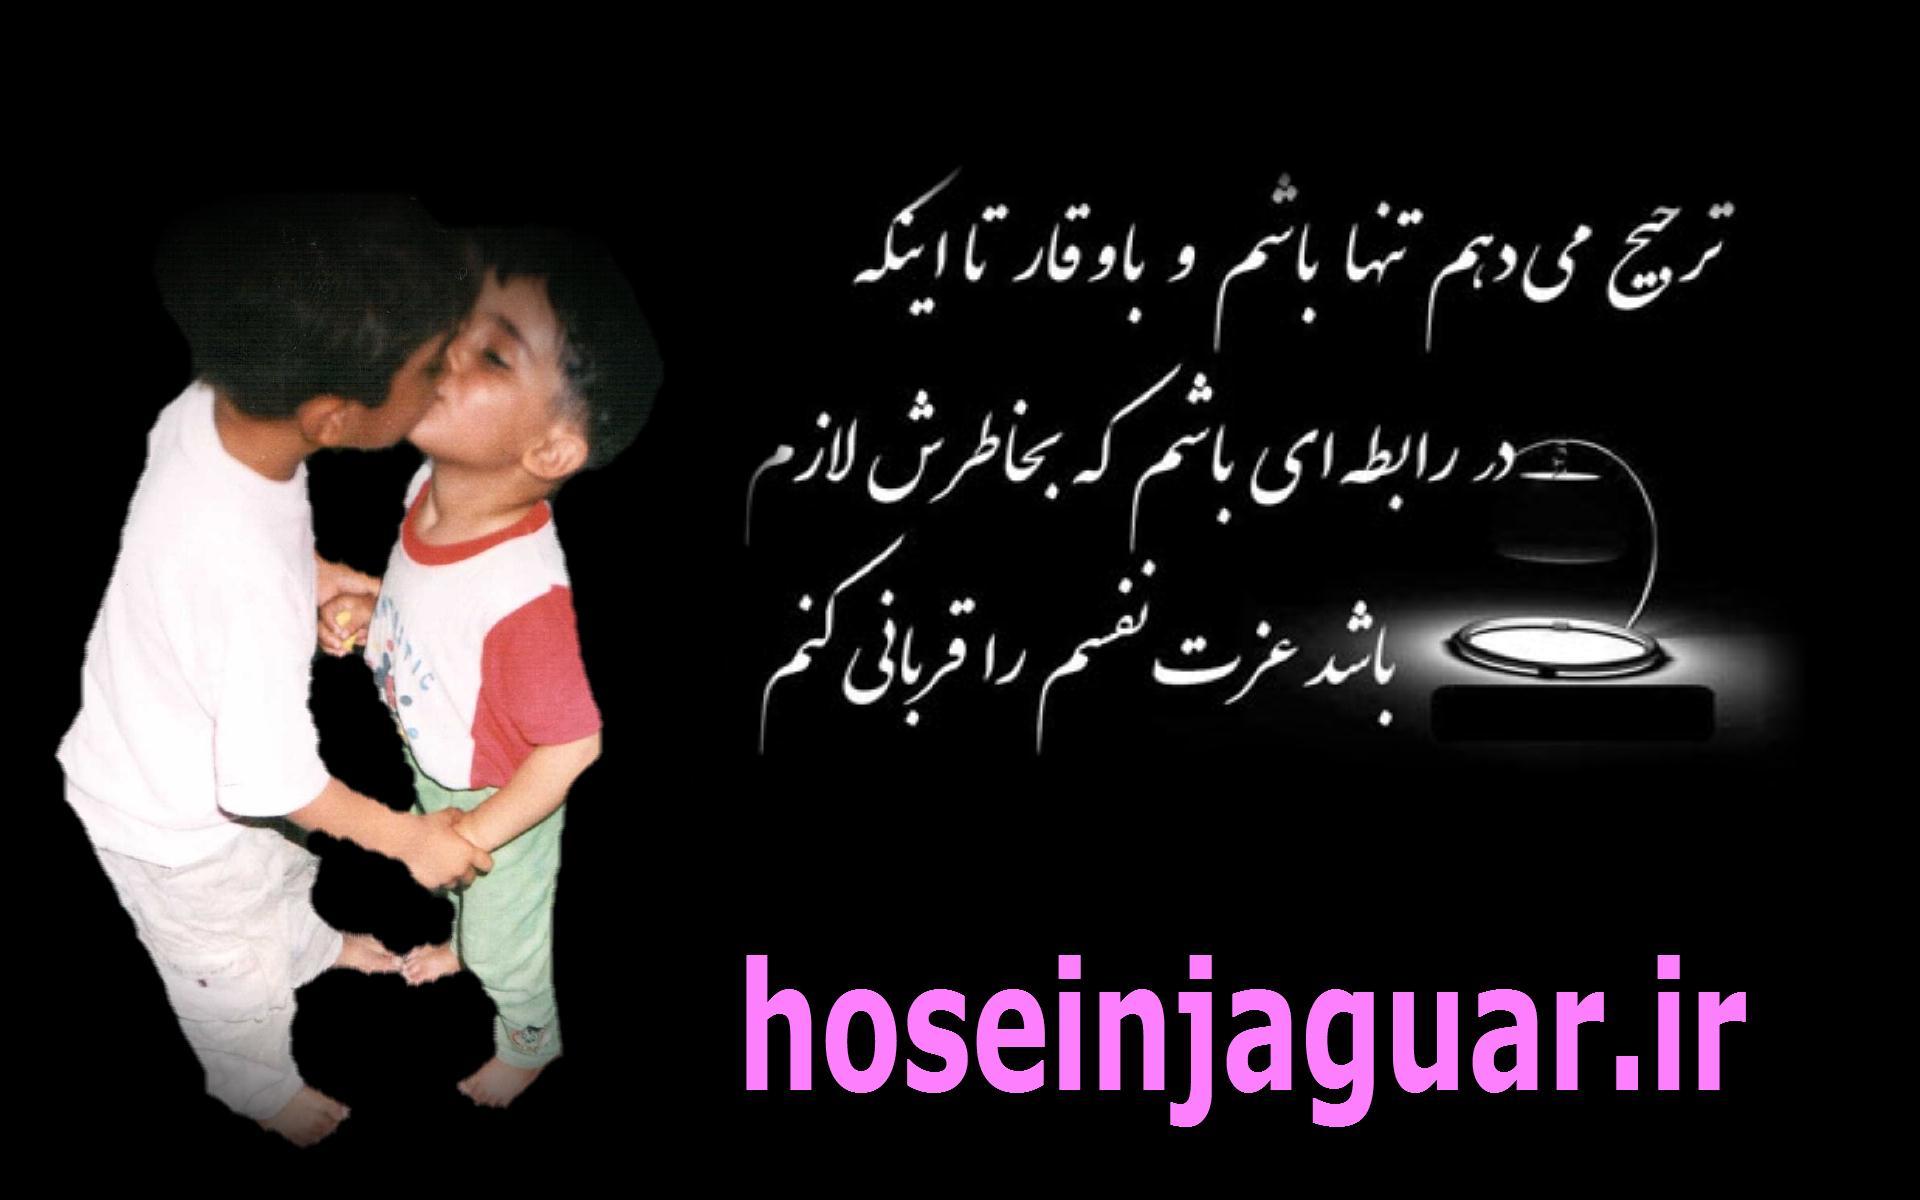 شعر و ادب پارسی ♥ دنیای عشق با شعر عشق♥jaguarLove